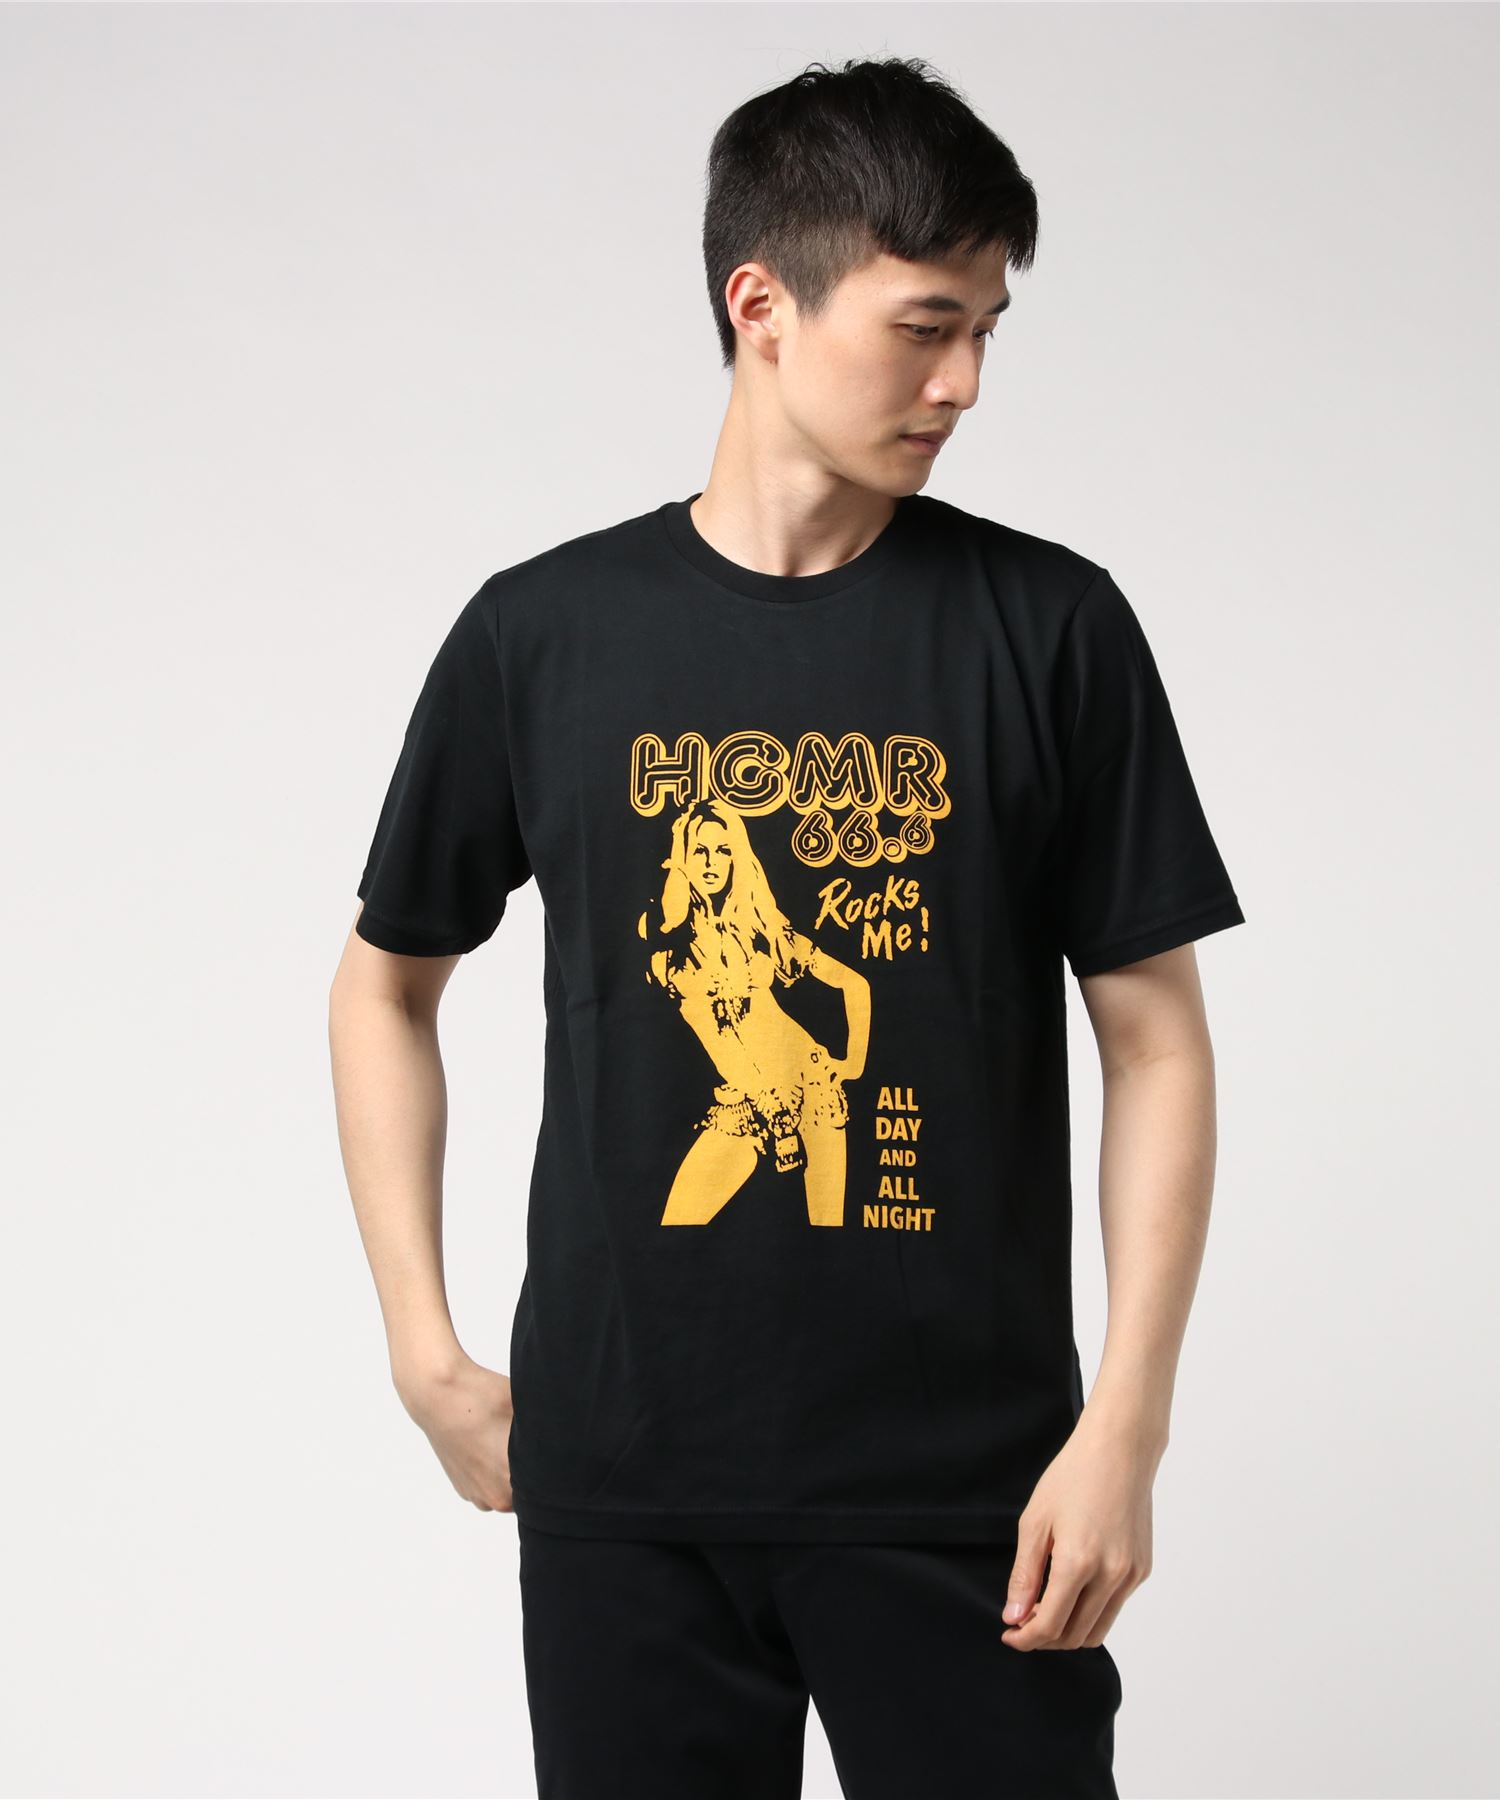 HGMR66 Tシャツ